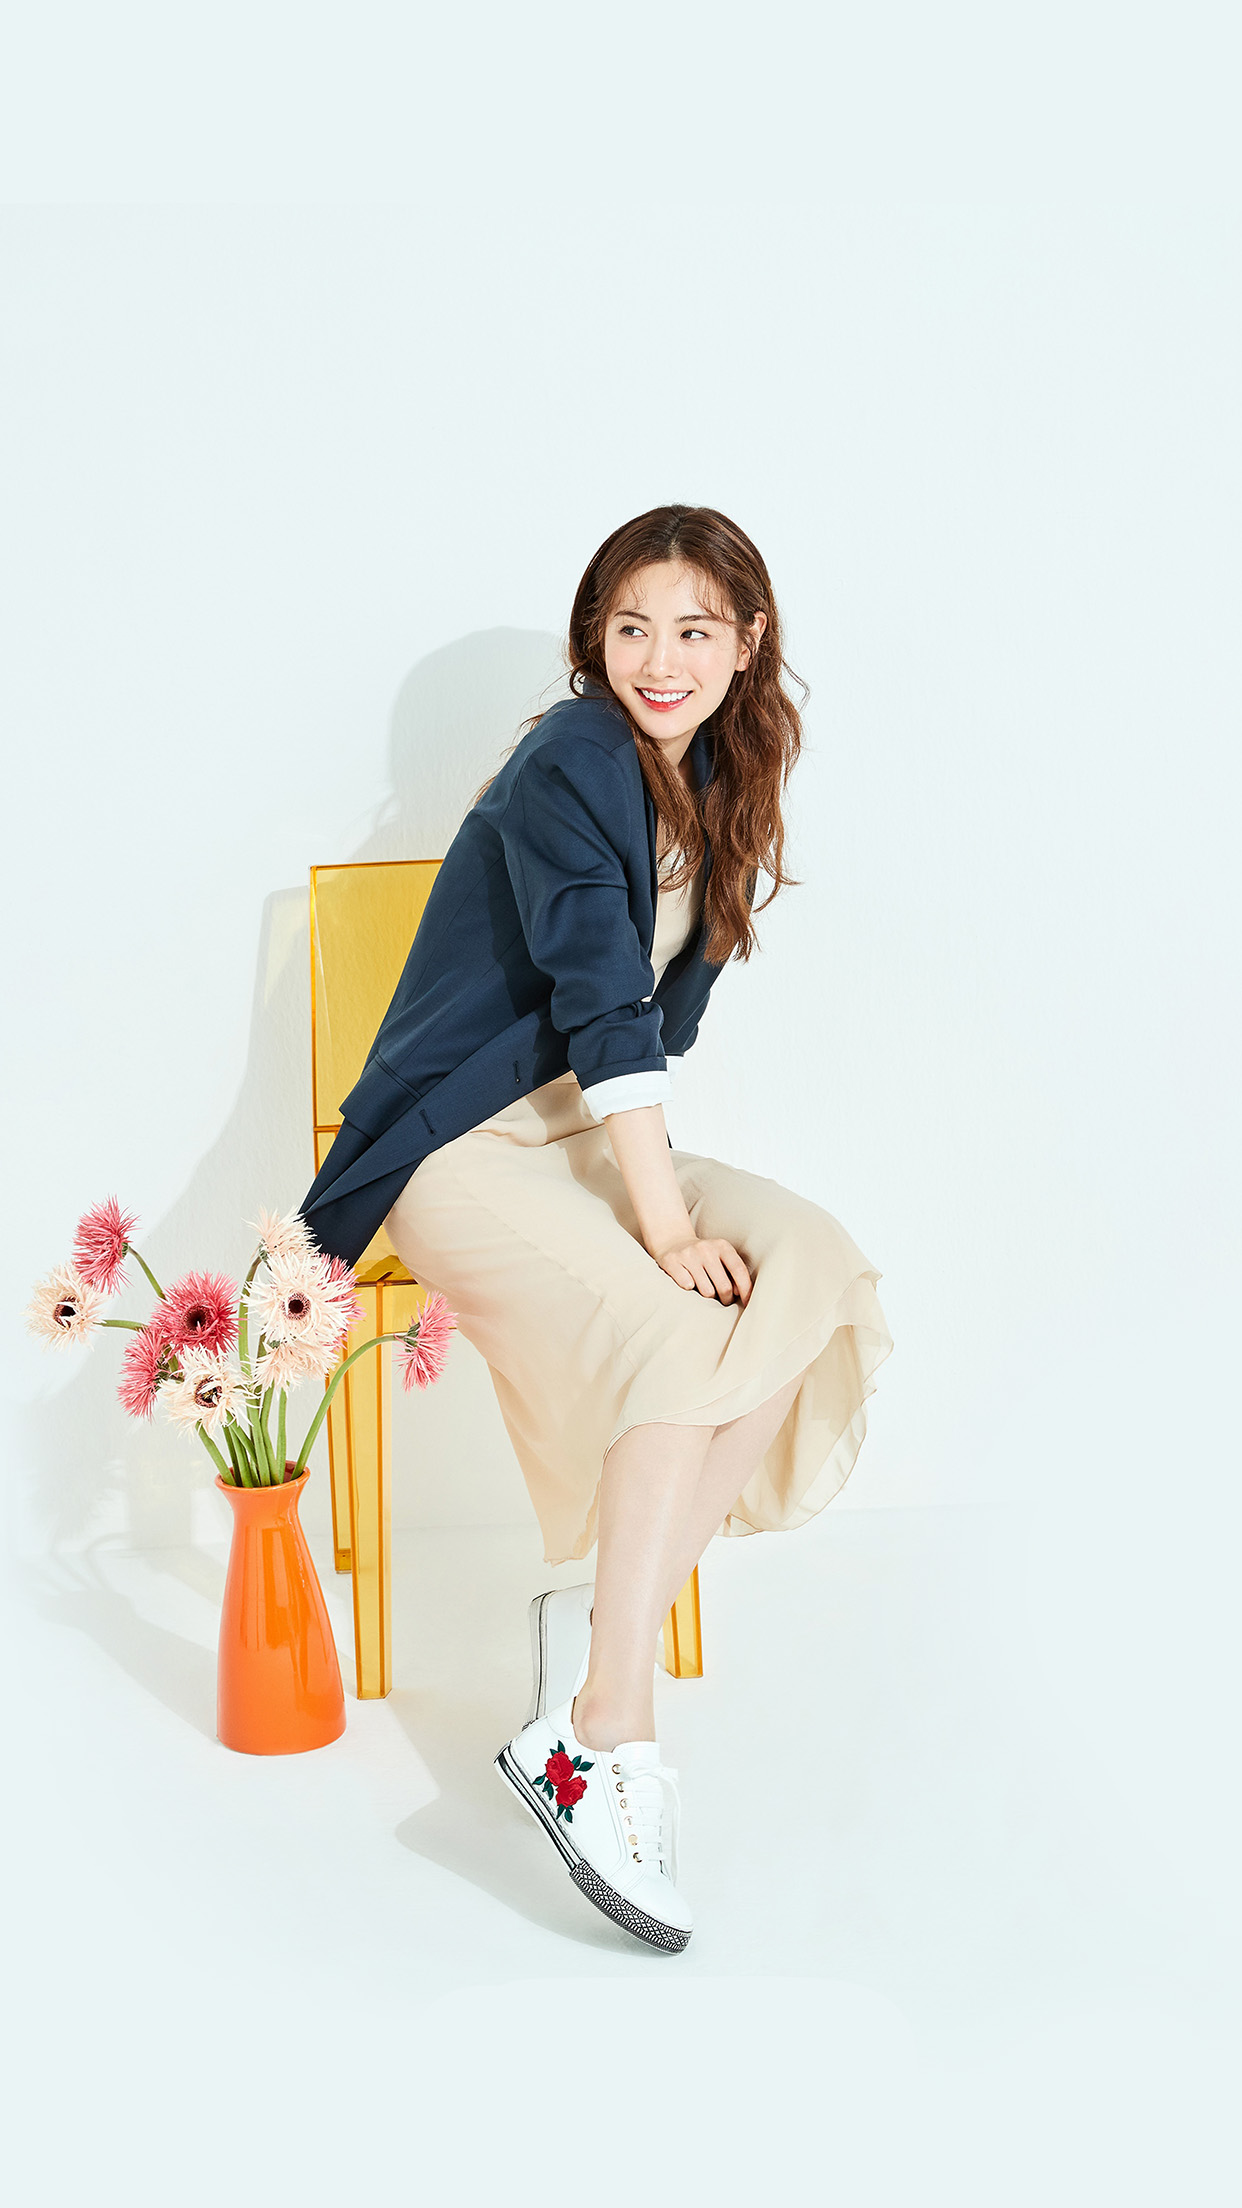 papers.co hr72 kpop girl korean cute 34 iphone6 plus wallpaper